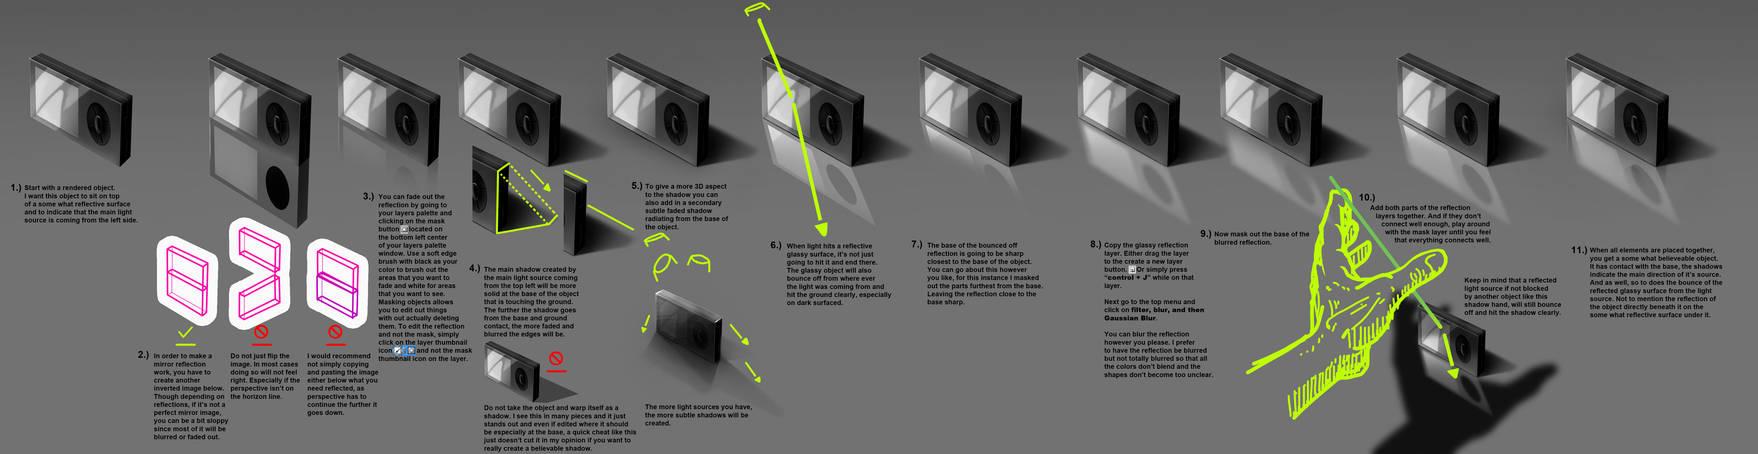 shadow reflection tutorial #0001 Learnuary